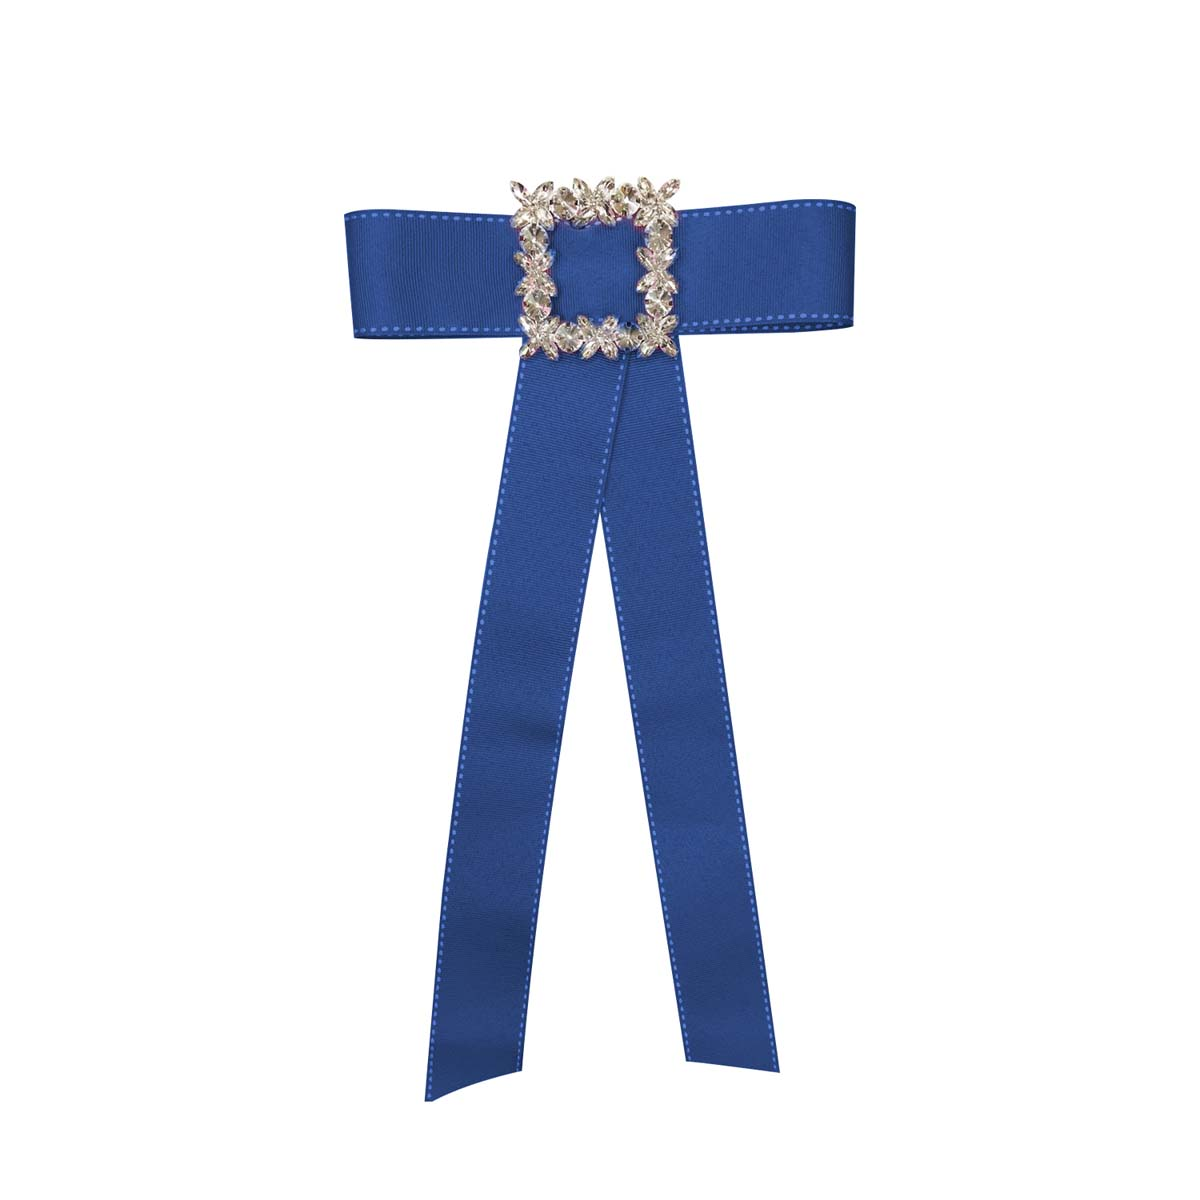 Teria Yabar - Broche lazo azul intenso